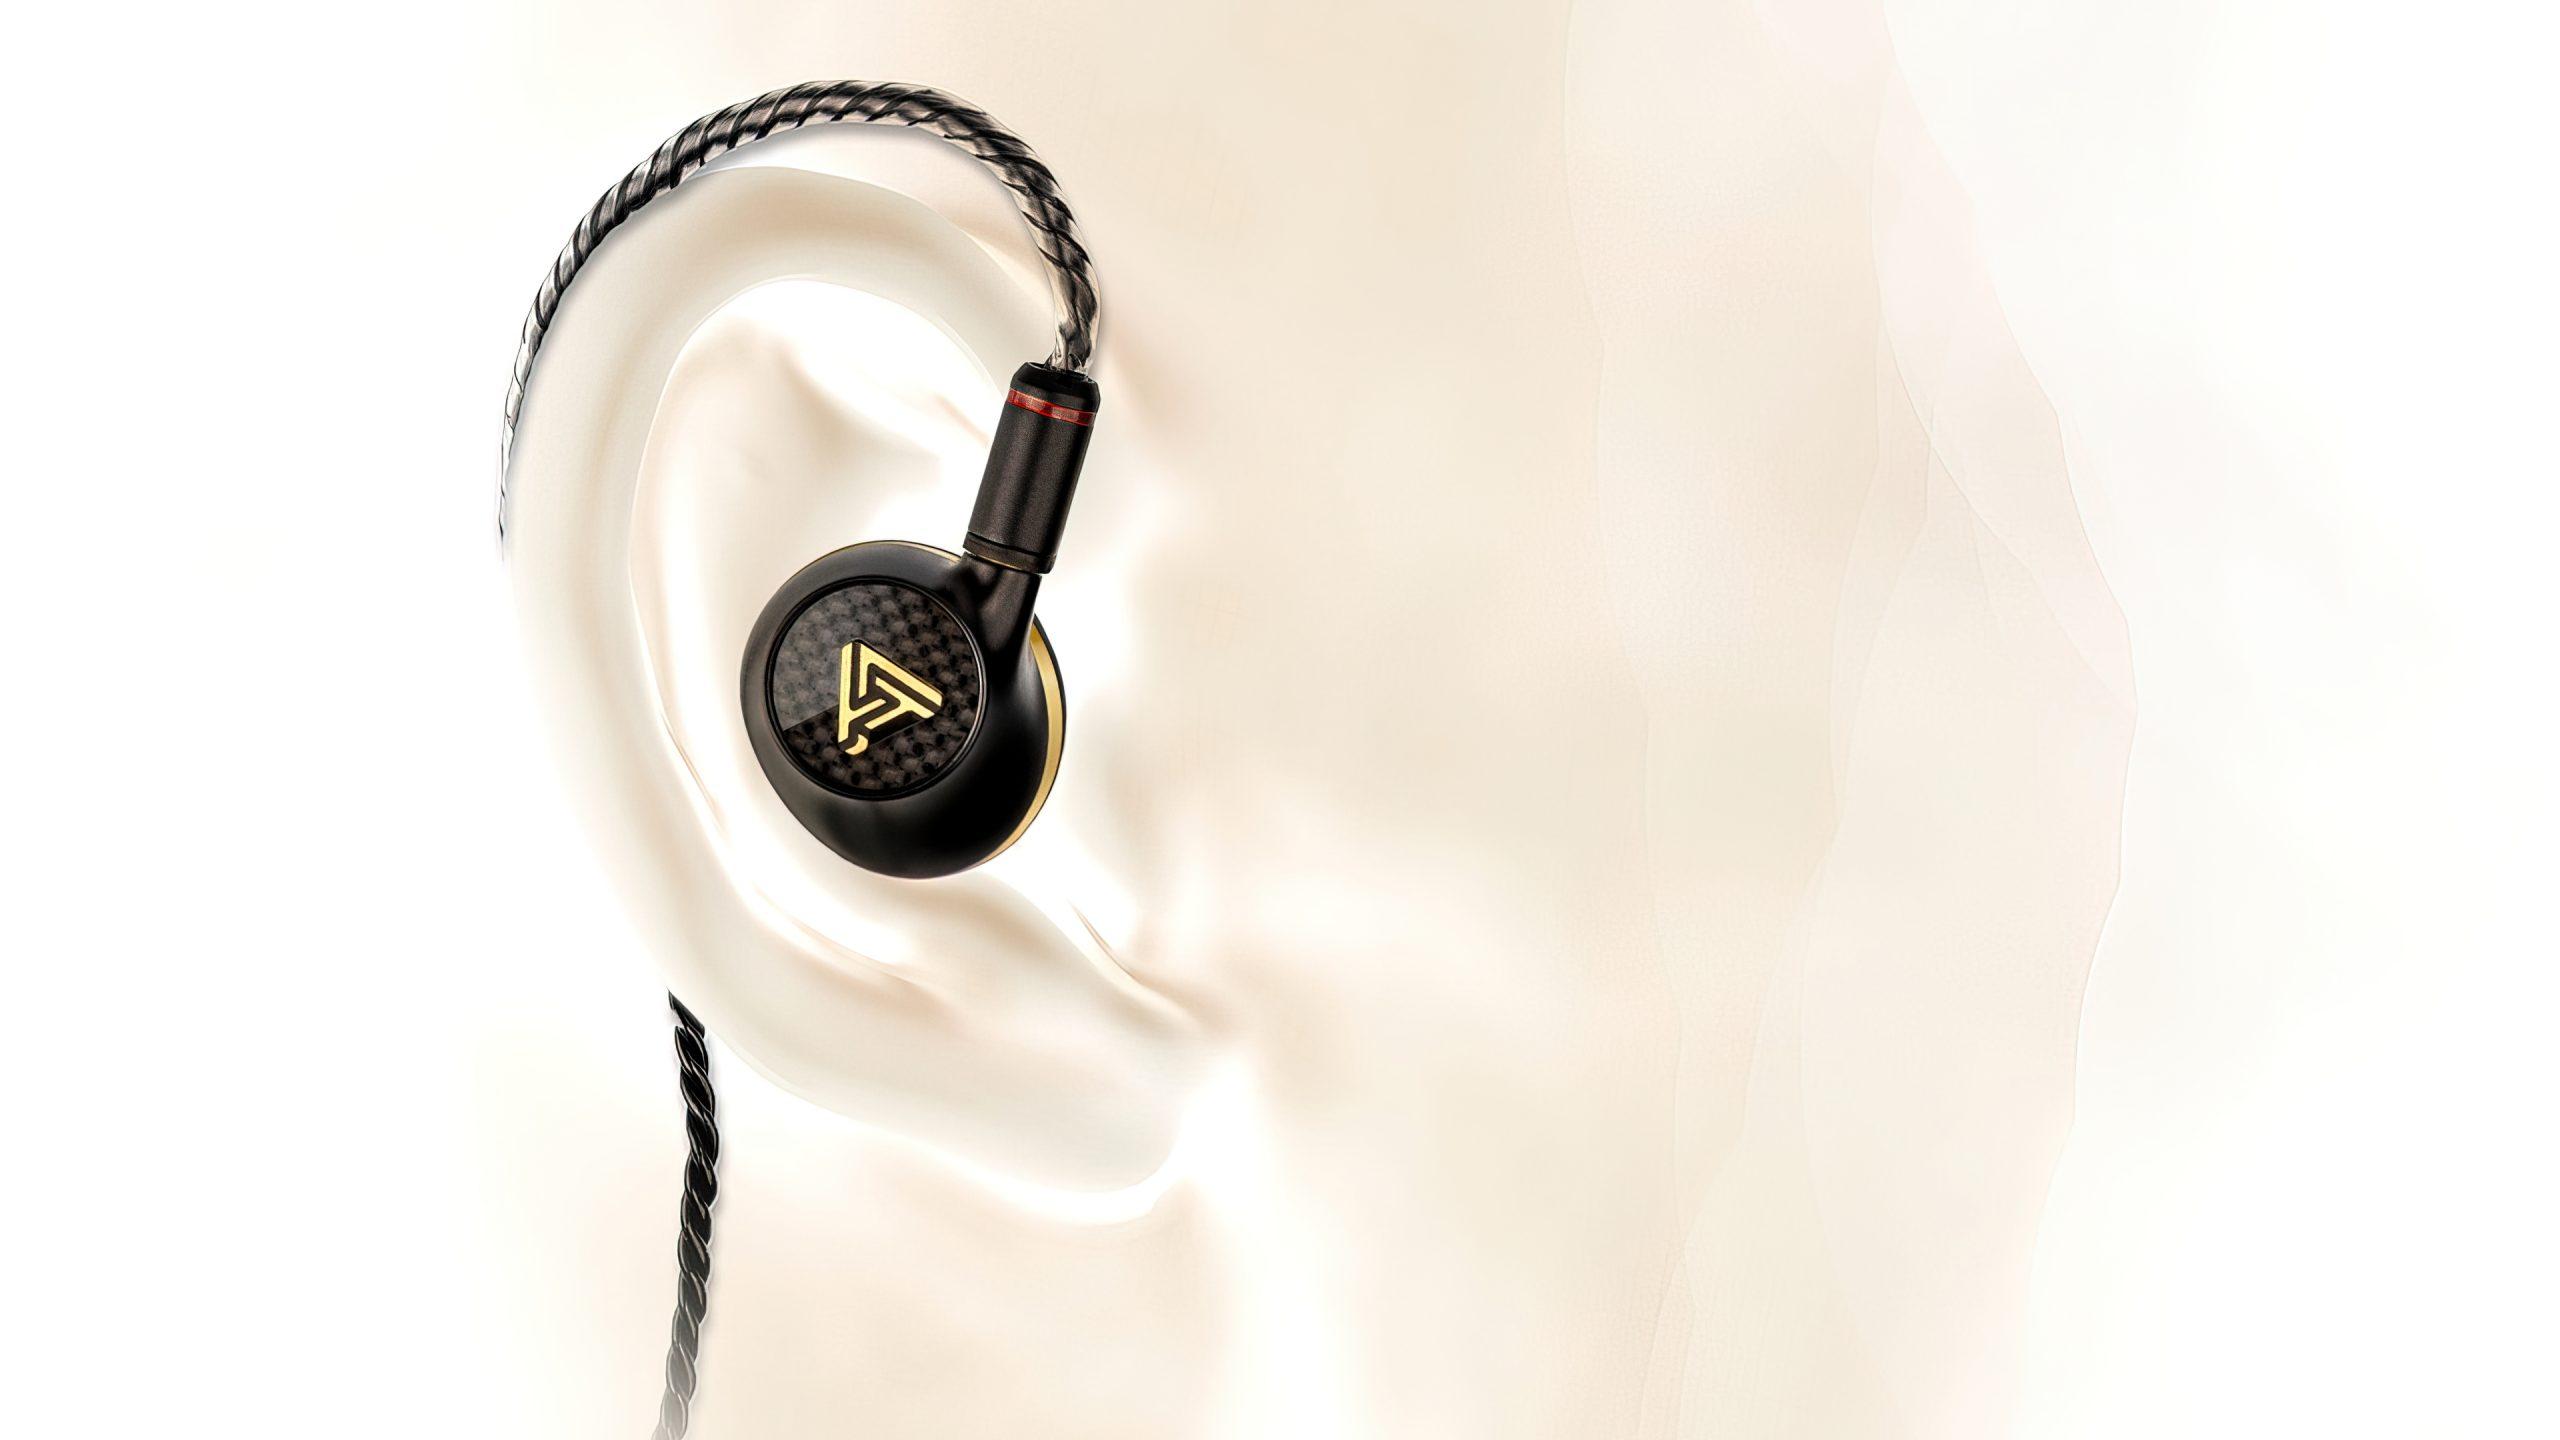 Audeze Euclid Ear Overlay-gigapixel-compressed-width-3840px